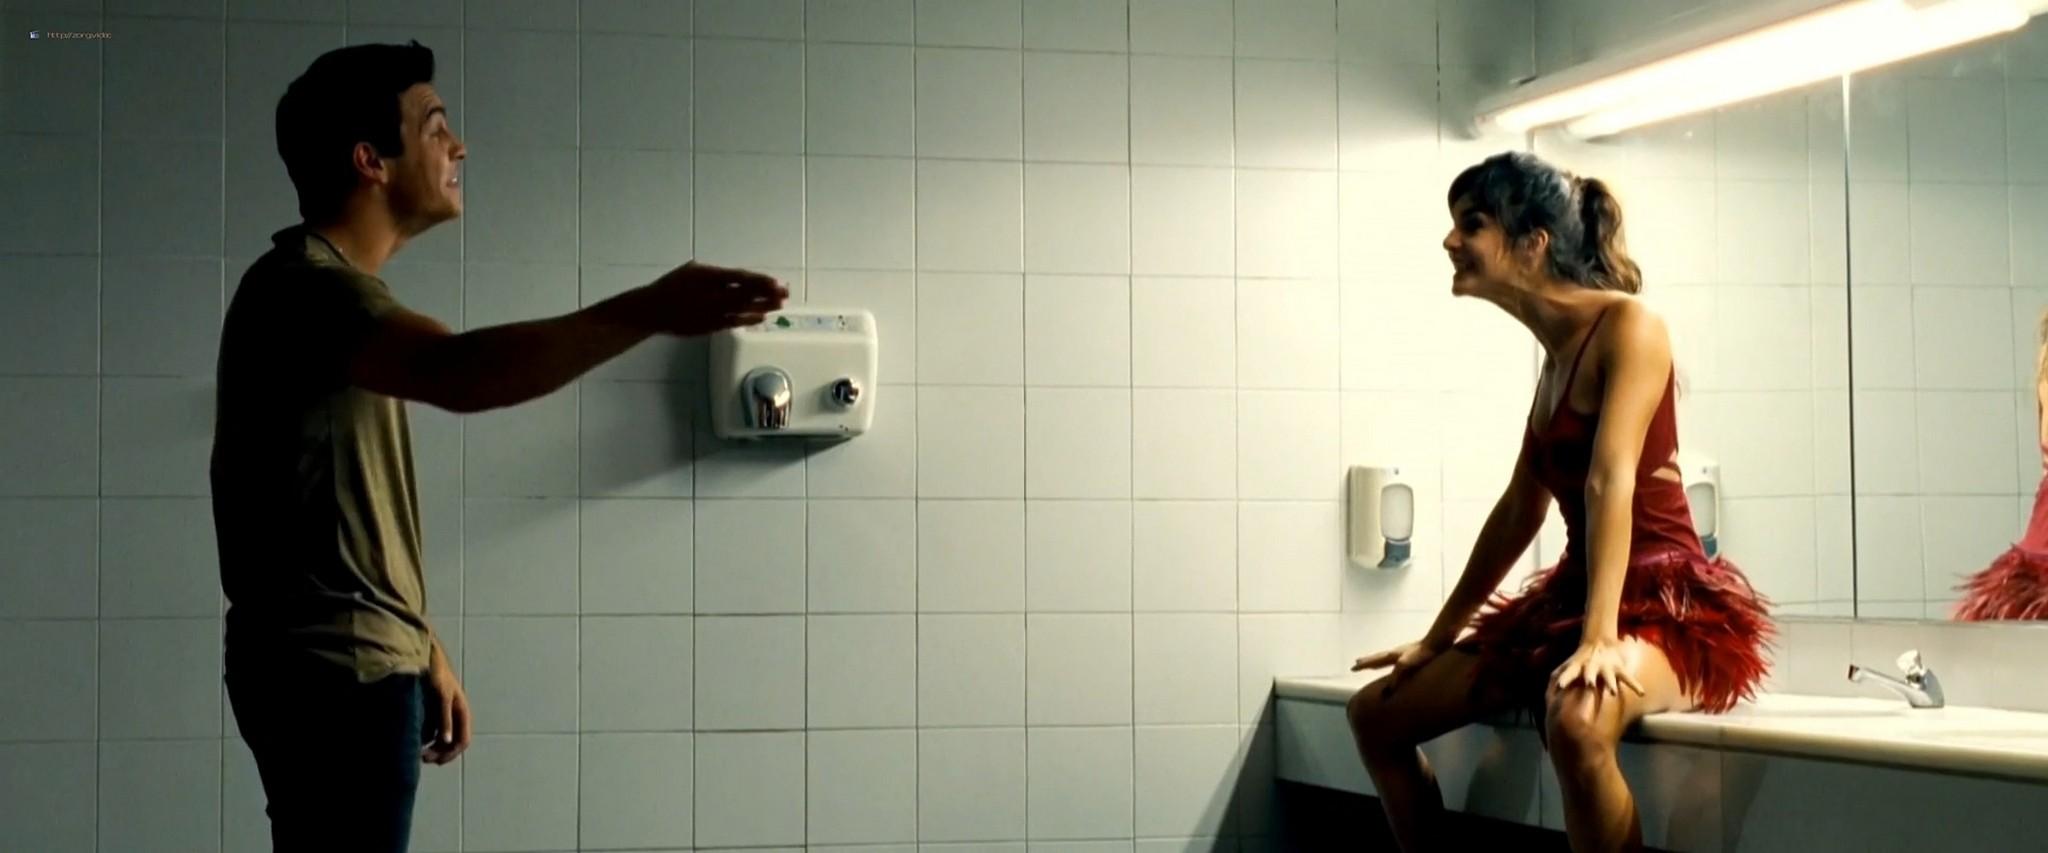 Clara Lago nude and hot sex from Tengo Ganas de ti 2012 HD 1080p Web 008